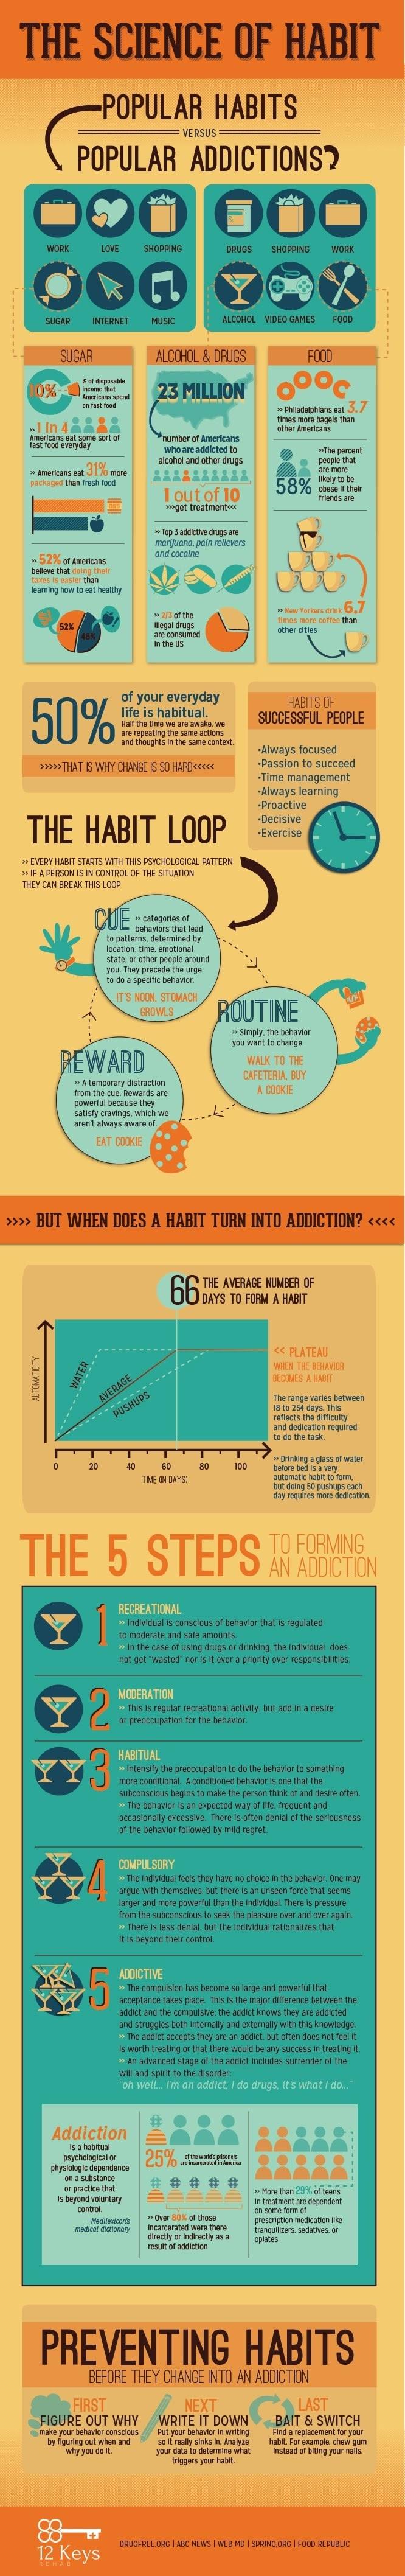 The Science Of Habit: Popular Habits Vs. Popular Addictions #infographic